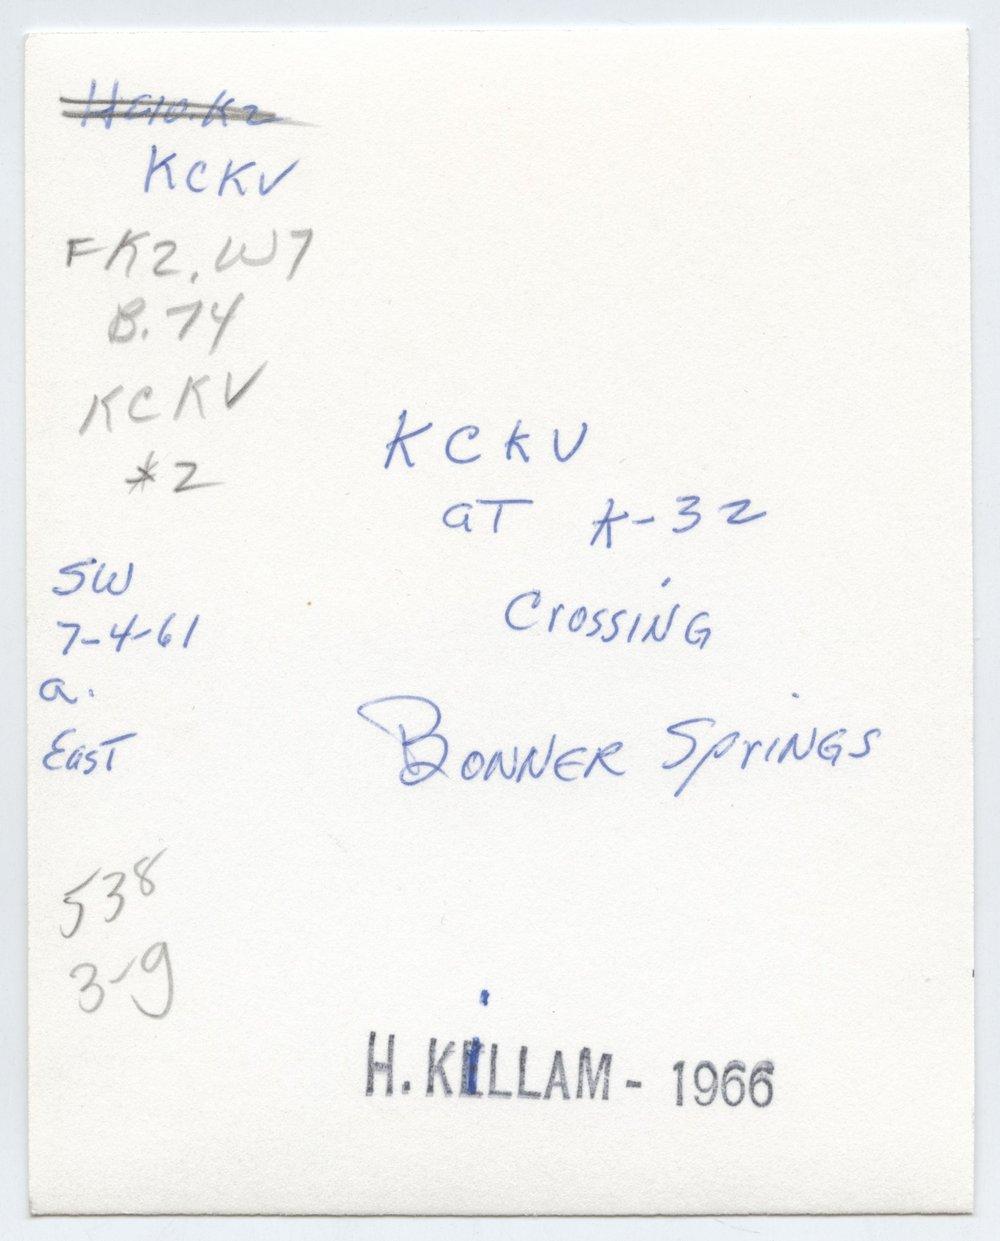 Kansas City, Kaw Valley K-32 crossing, Bonner Springs, Kansas - 2